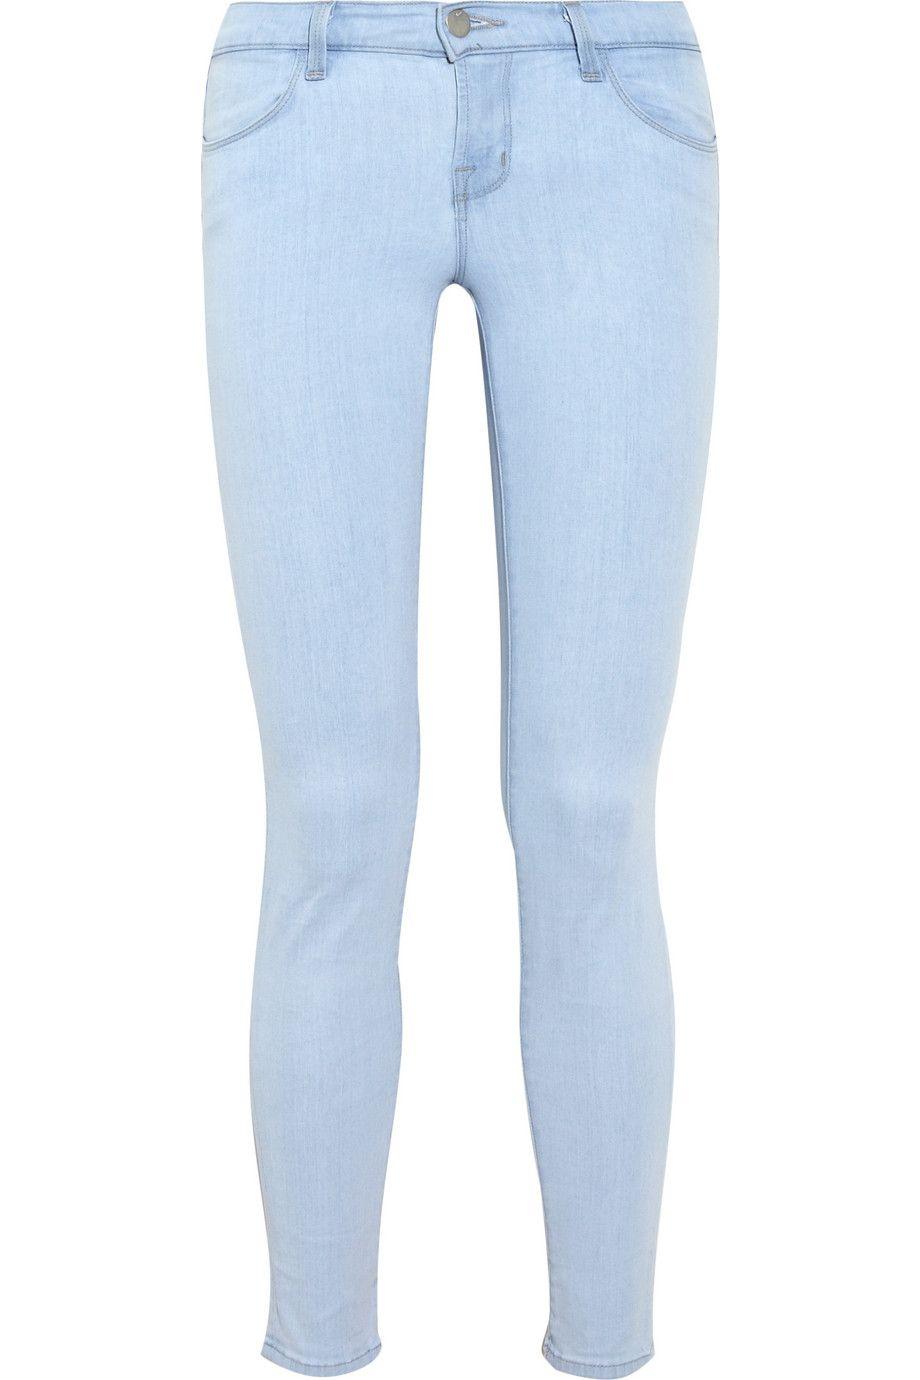 J Brand Denim - 620 Power Stretch light-blue low-rise skinny jeans